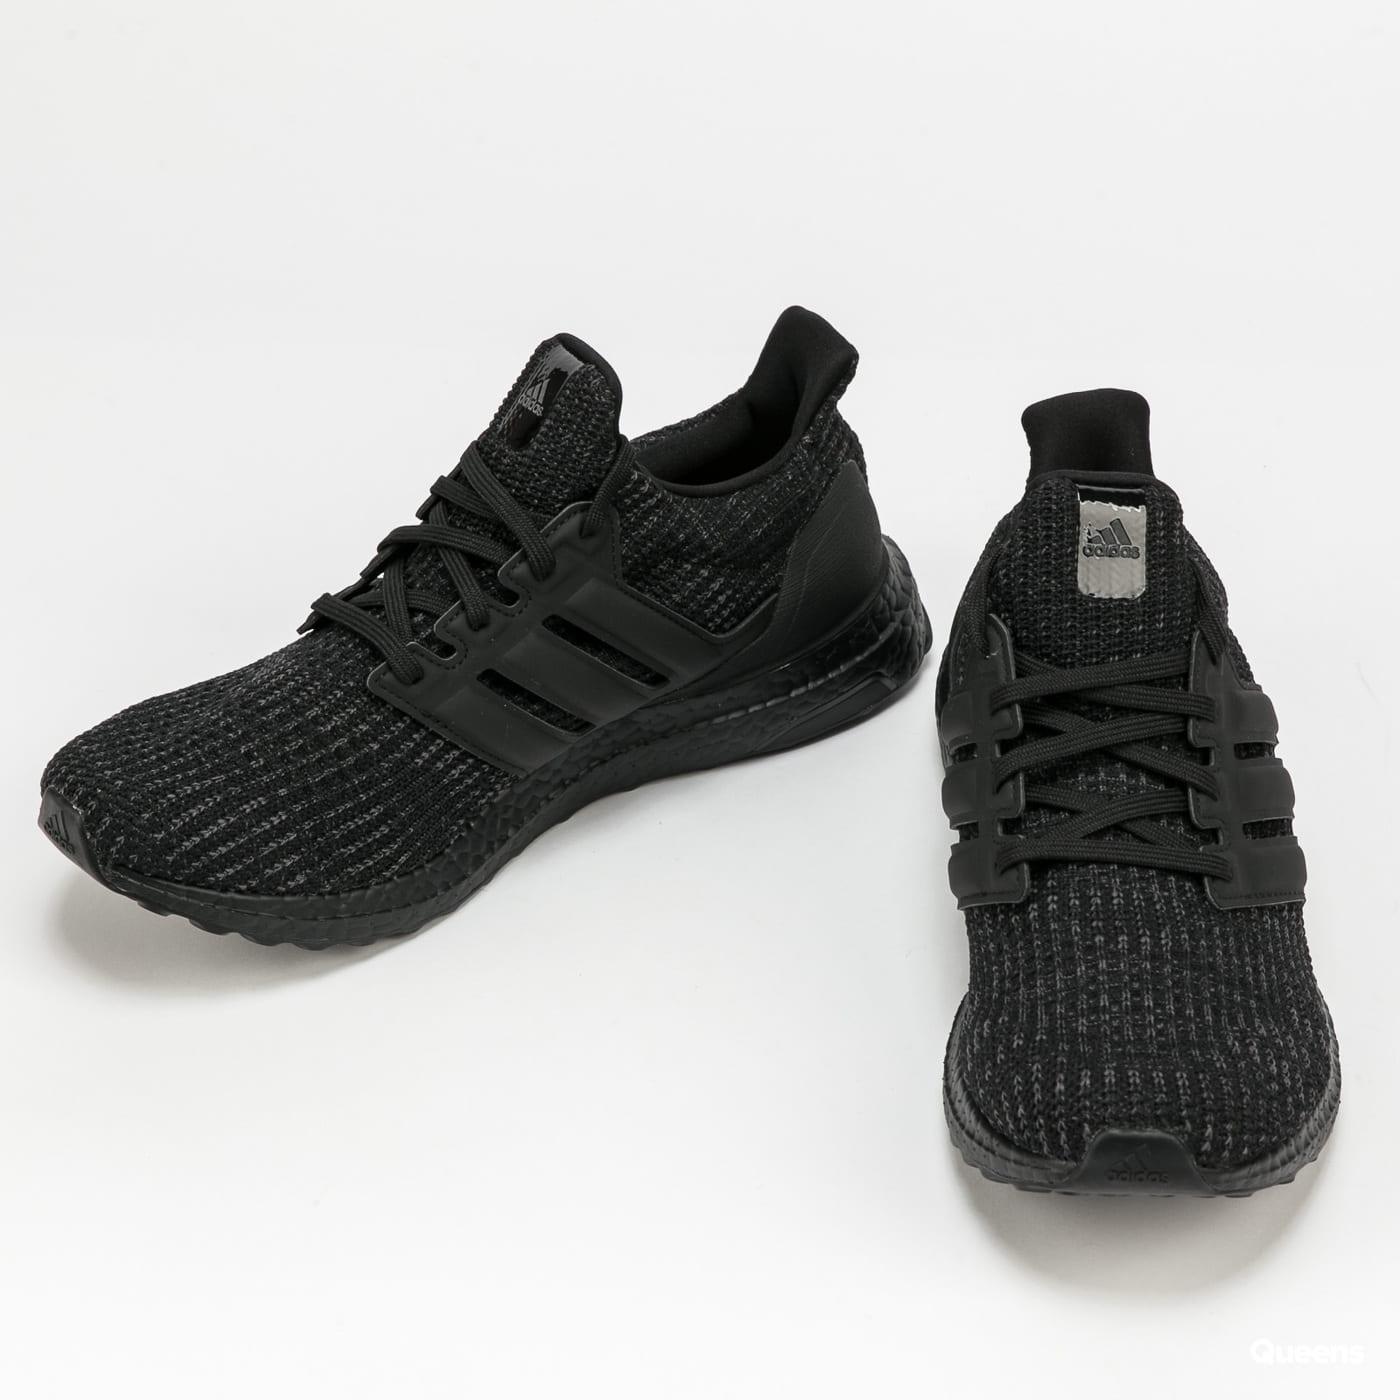 adidas Performance Ultraboost 4.0 DNA cblack / cblack / gresix